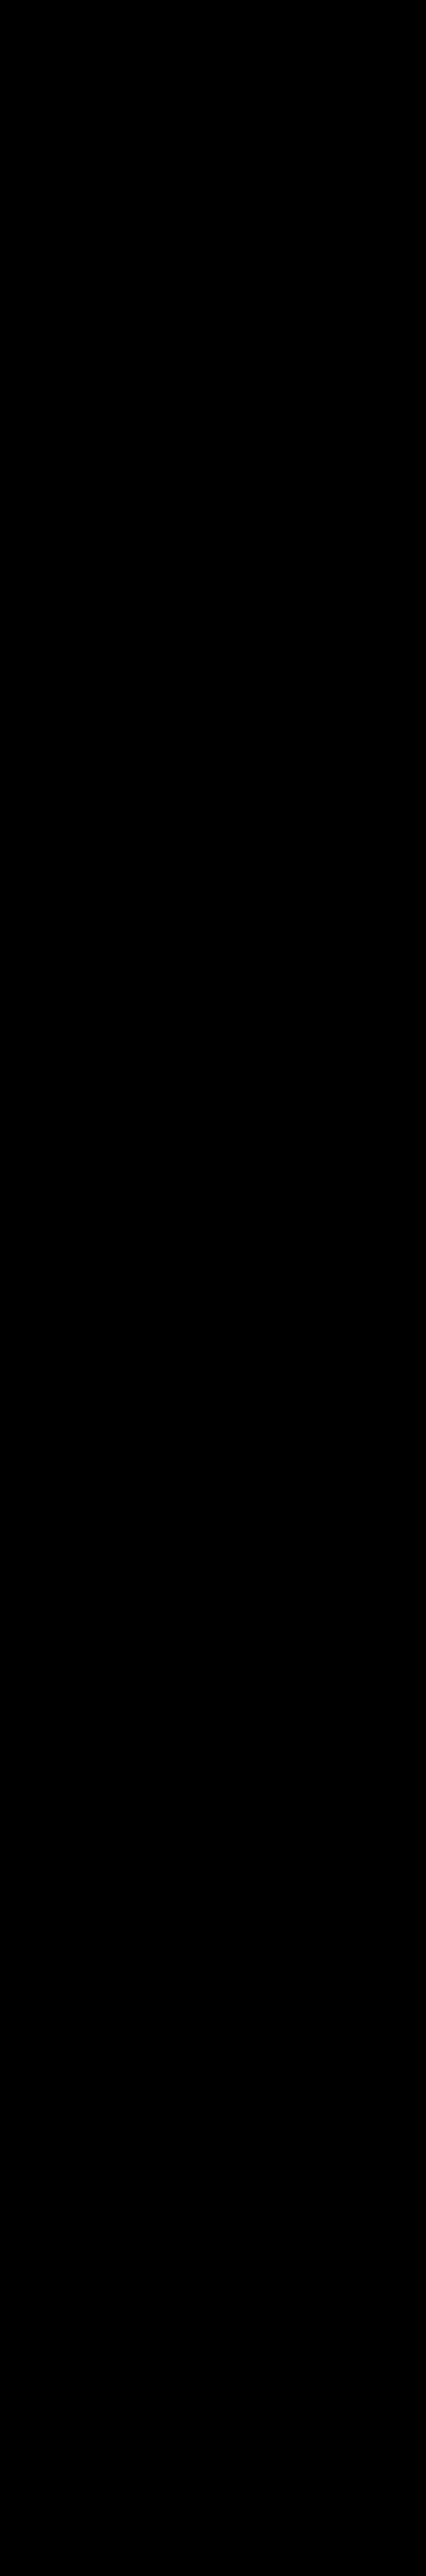 Maz Consultants Architects Engineers Company 2, 9a Street 2 Floor, Office 204 Port Saeed - 129, Deira, Dubai | www.HaiUAE.com is a complete Travel Guide to Dubai, Ajman, Alain, Abu Dhabi, Fujairah, Sharjah, Ras al khaimah, Umm Al Quwain, United Arab Emirates, GCC Countries. Explore more about Exhugust, Exhaust, Al Reef International Hospital, Dubai Companies List With Email Address